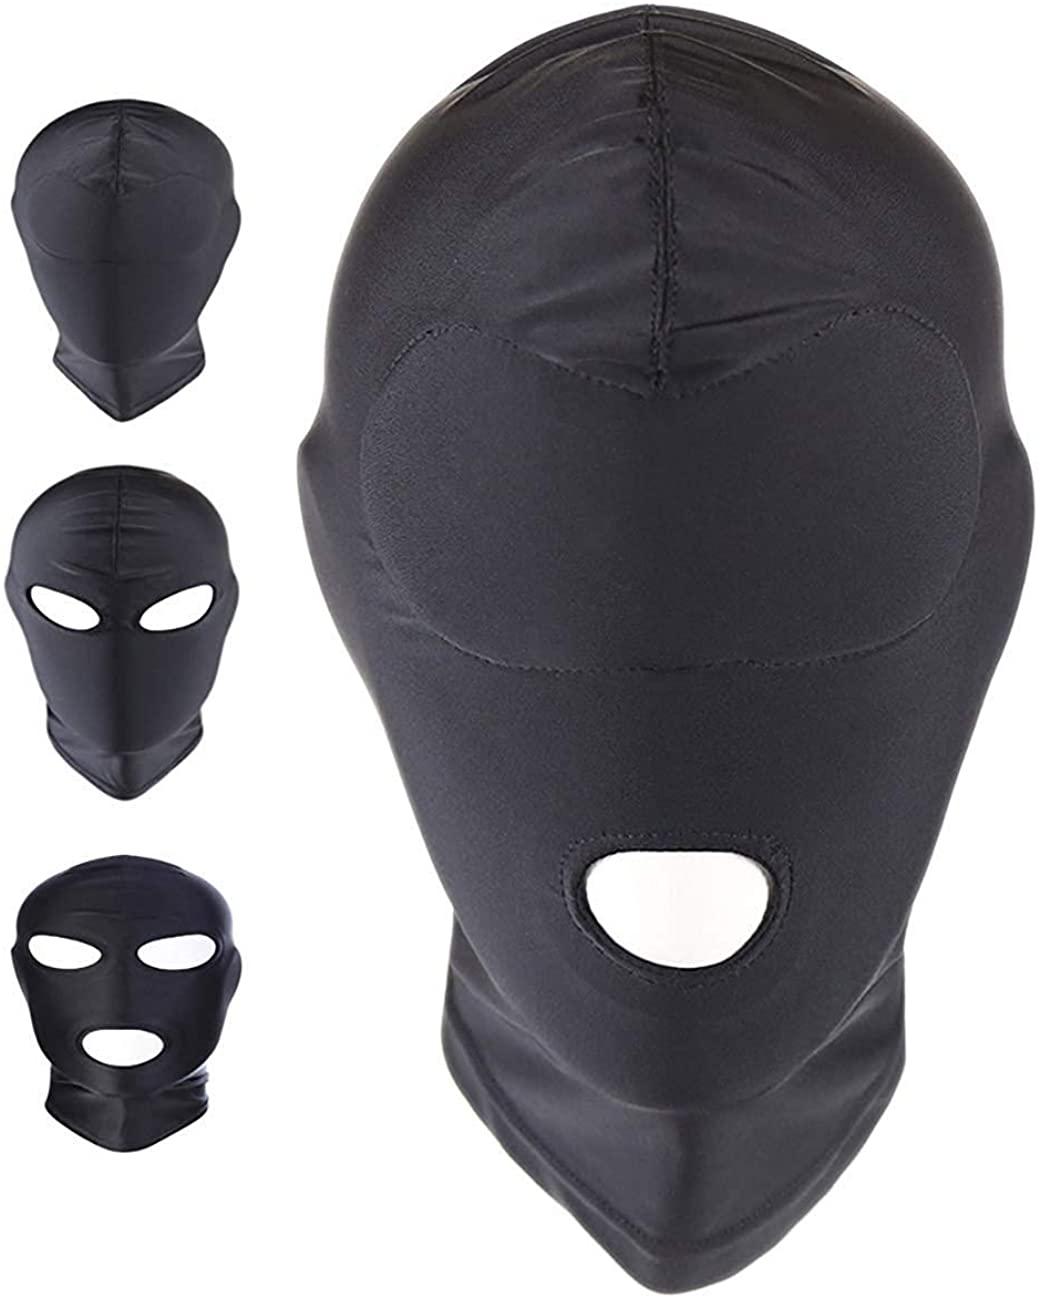 OMFMF Black Breathable Full Cover Spandex Zentai Costume Hood Mask